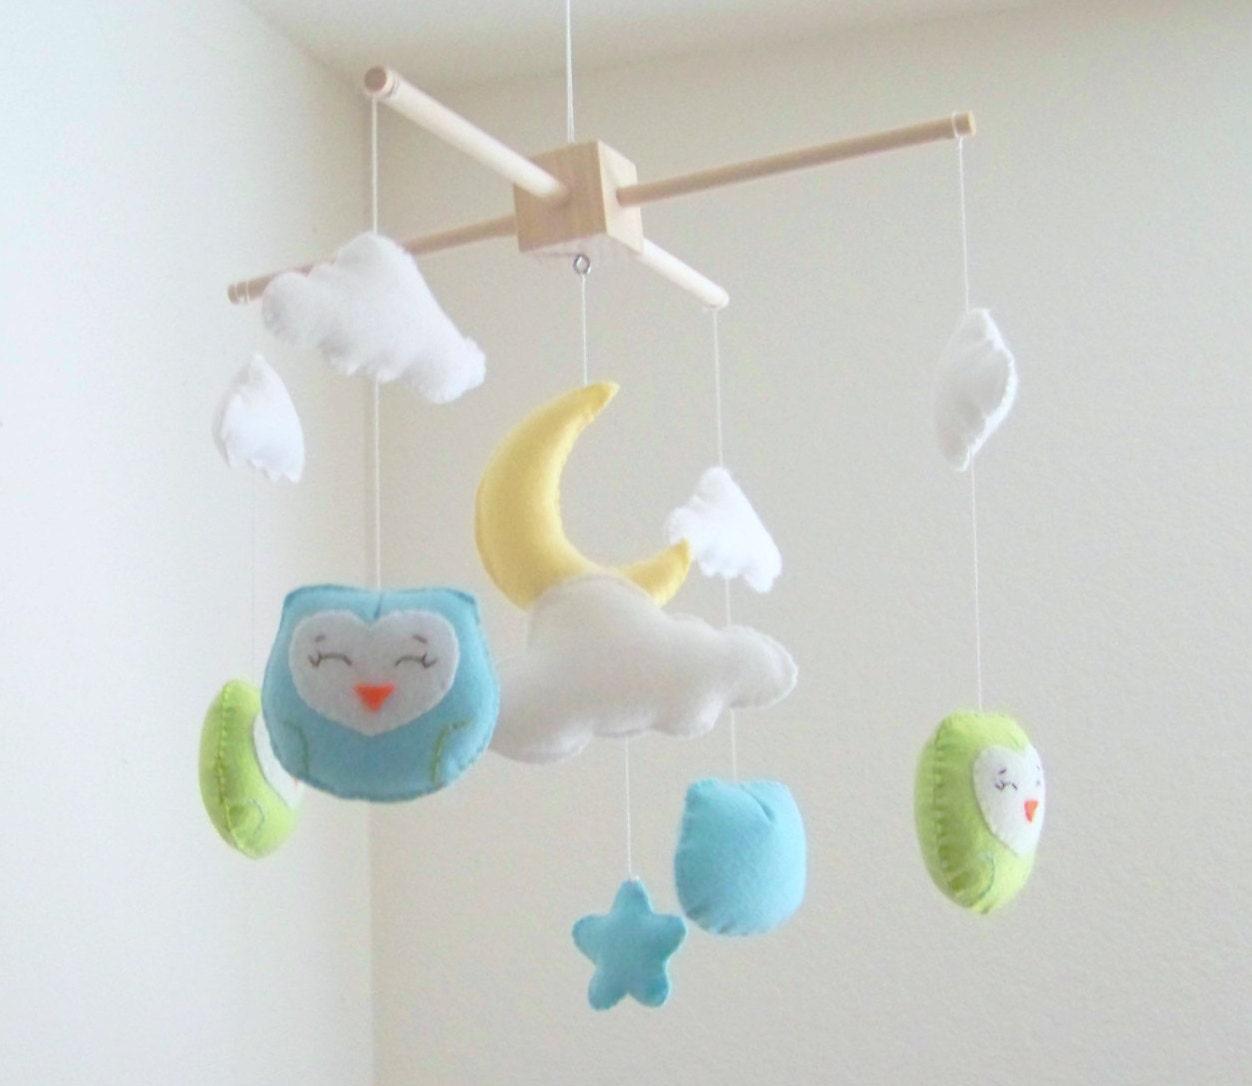 Eule Babymobile mobile Wolke Mond-Baby-Mobile blau und grün